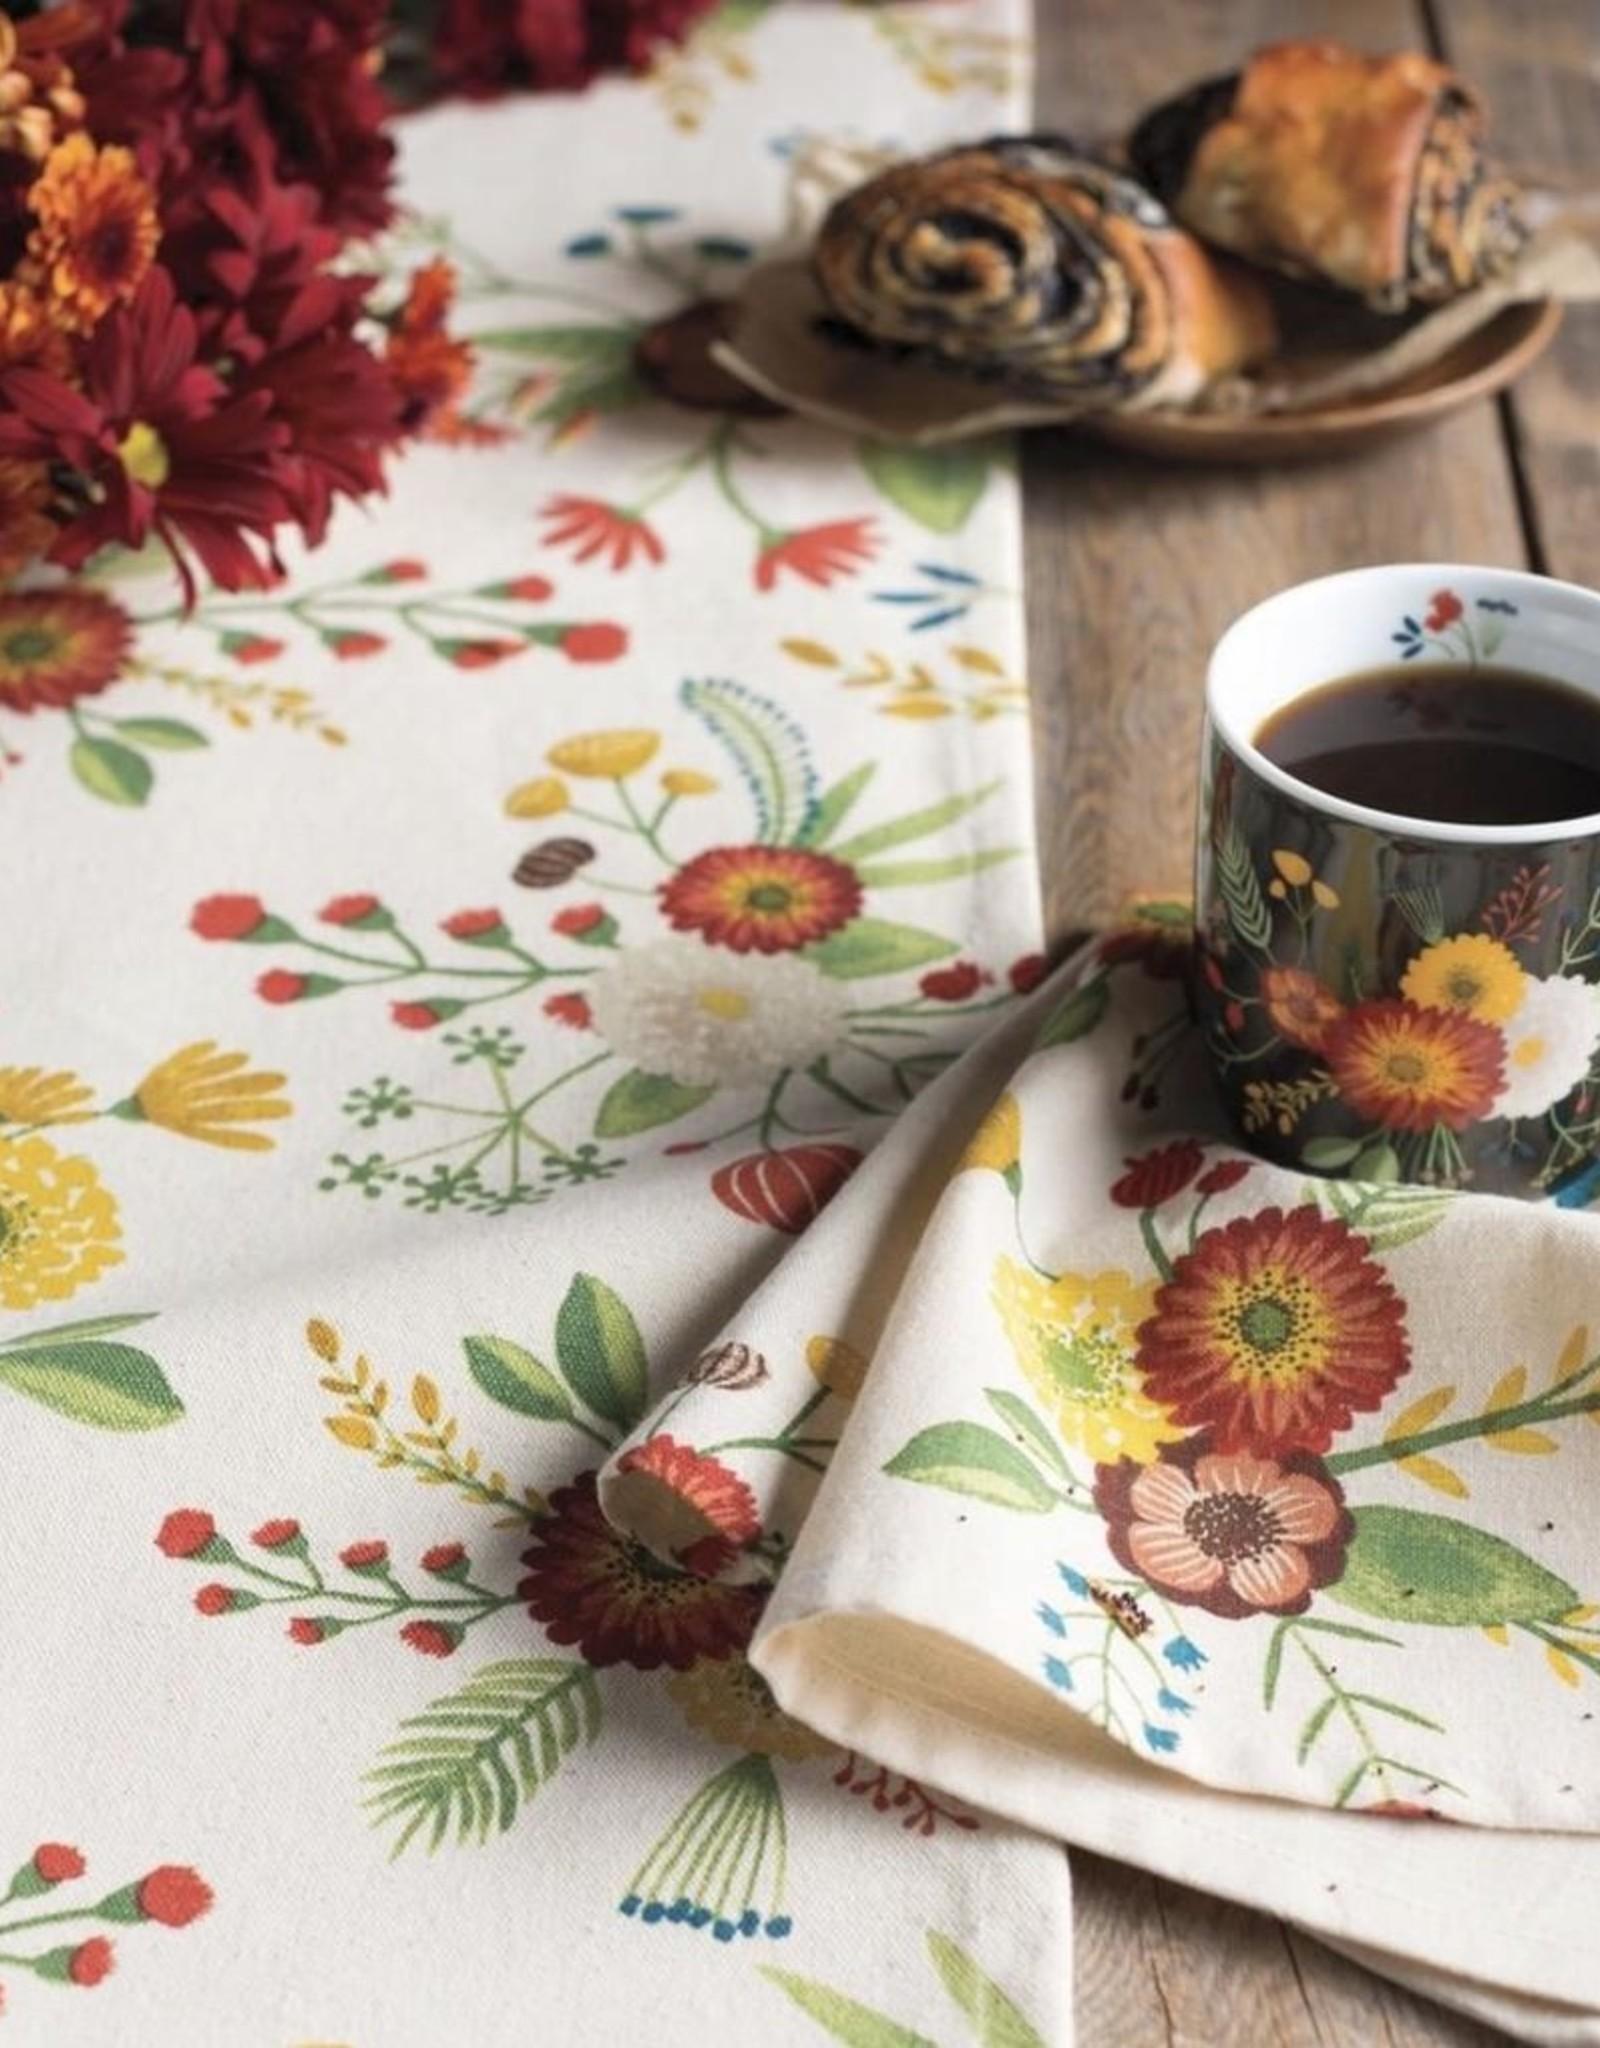 Goldenbloom Tablecloth 100% Cotton - 60x120